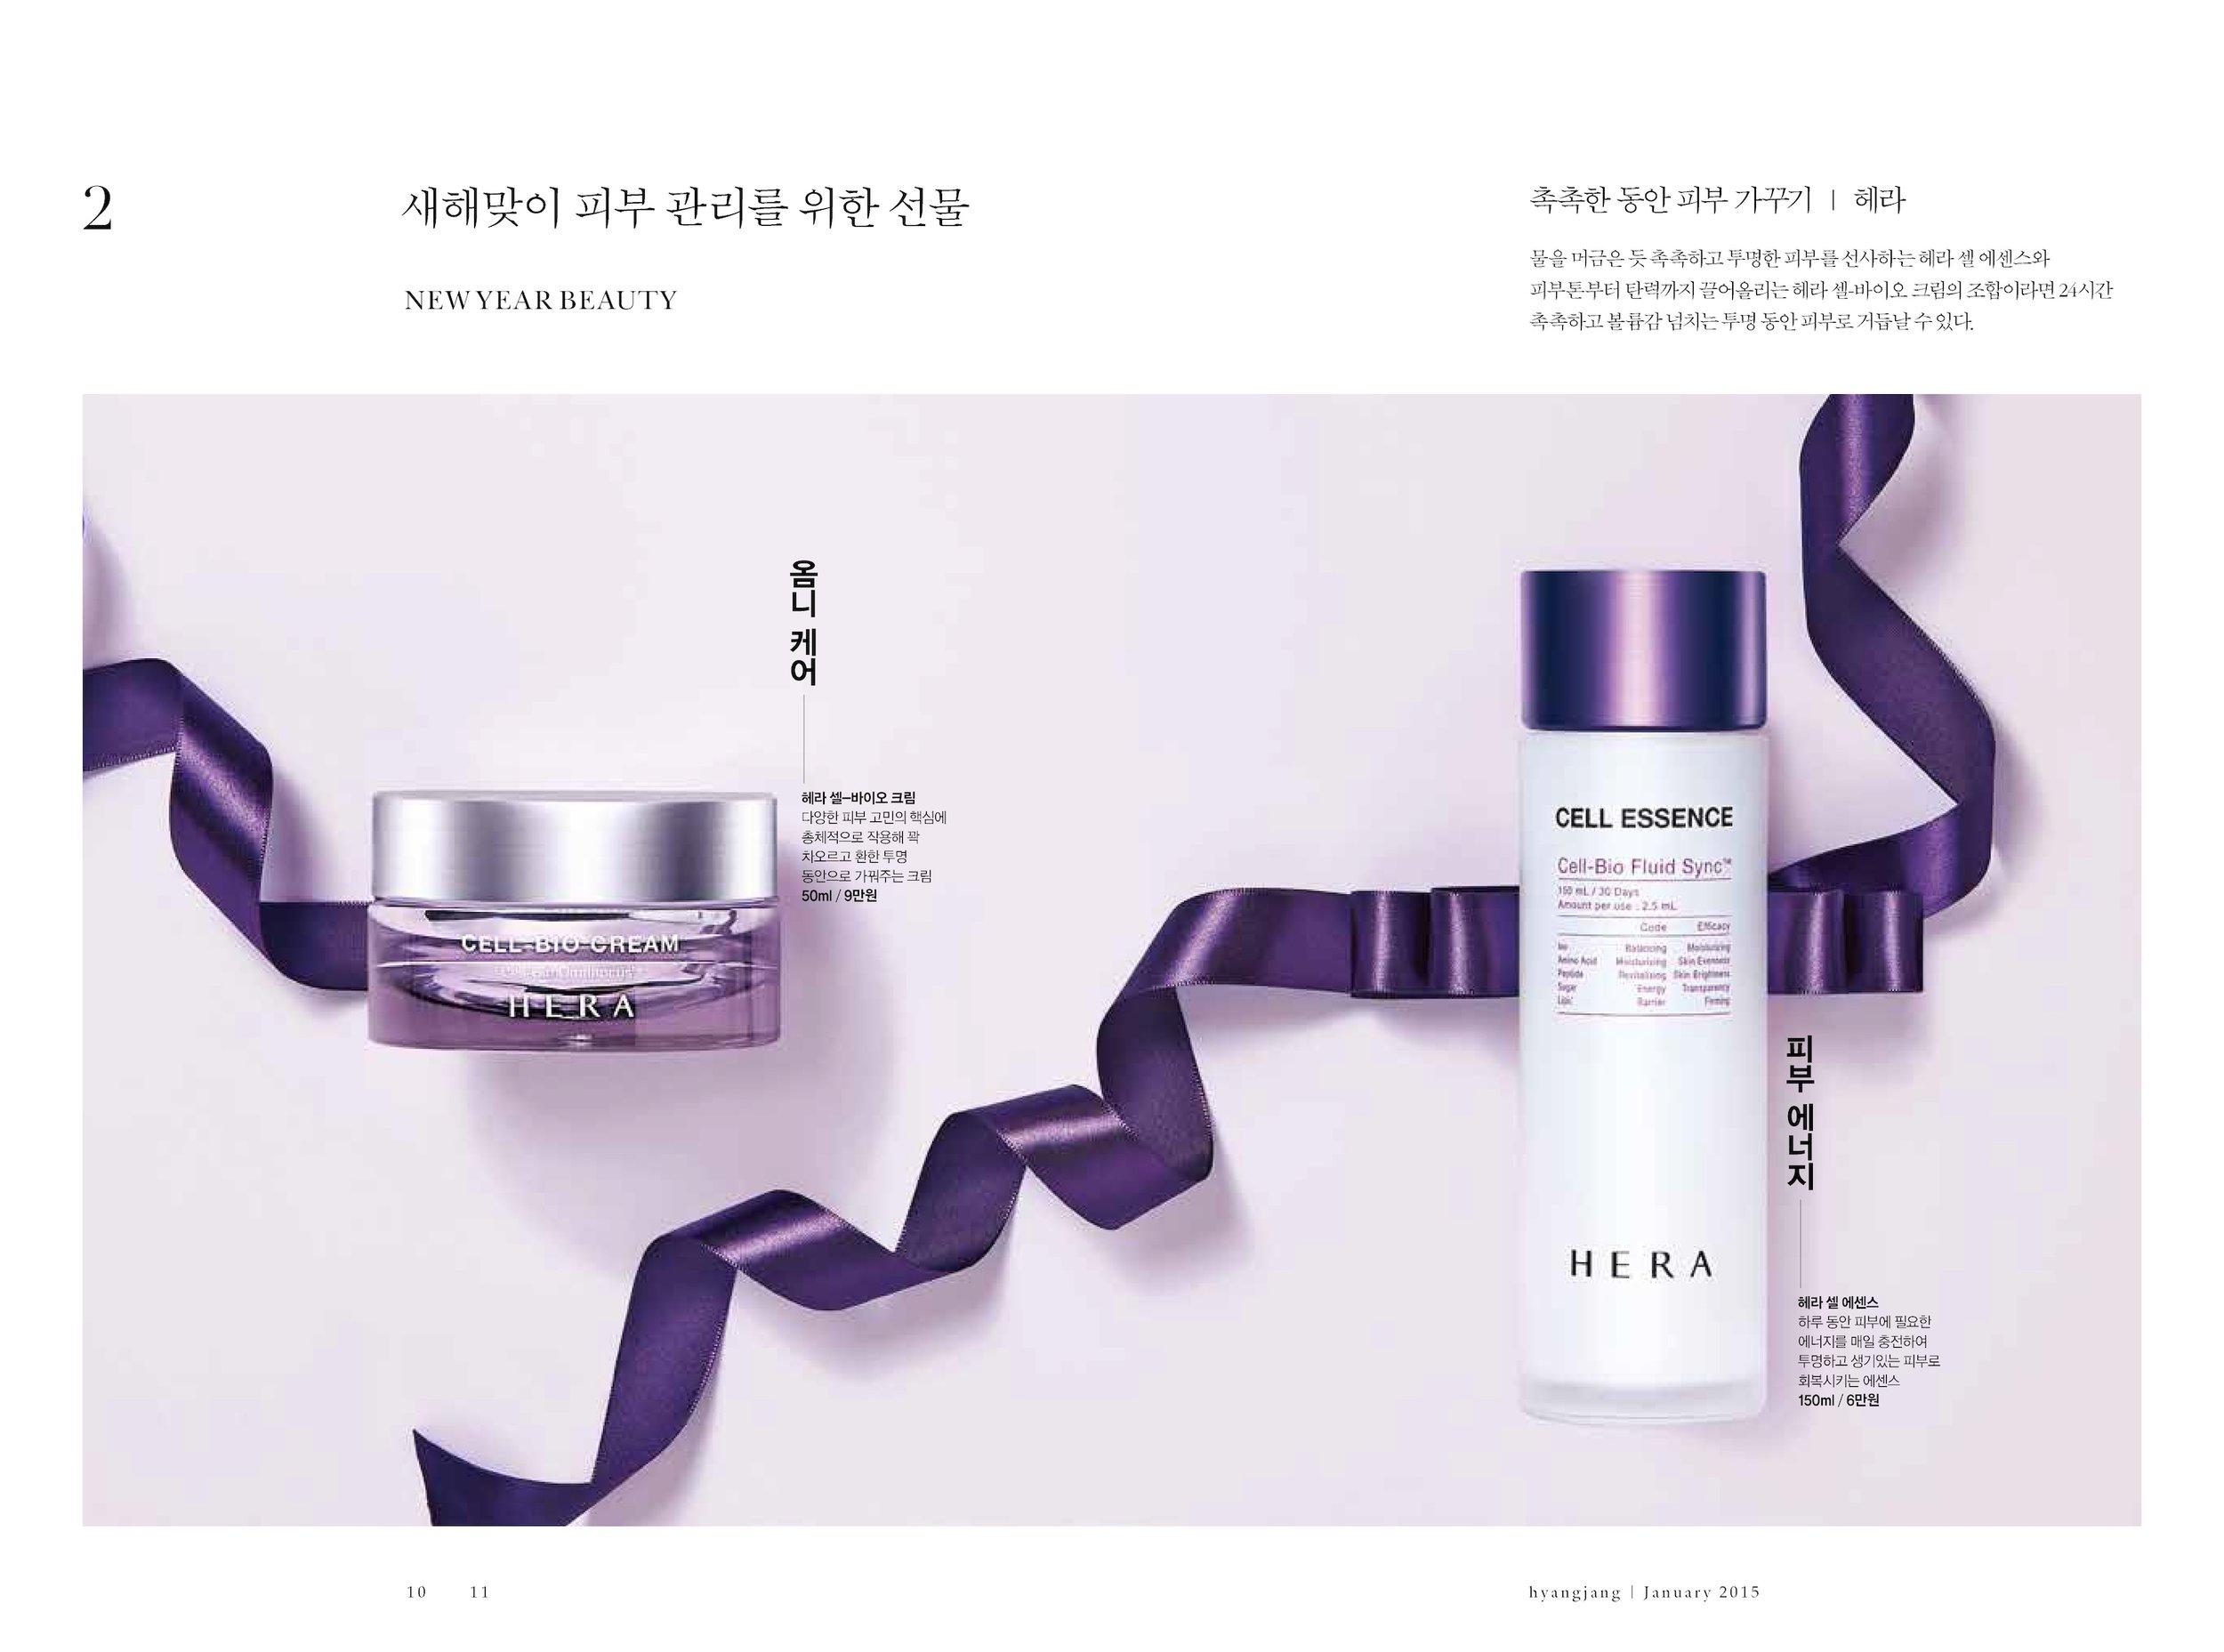 hyangjang-201501_페이지_06.jpeg